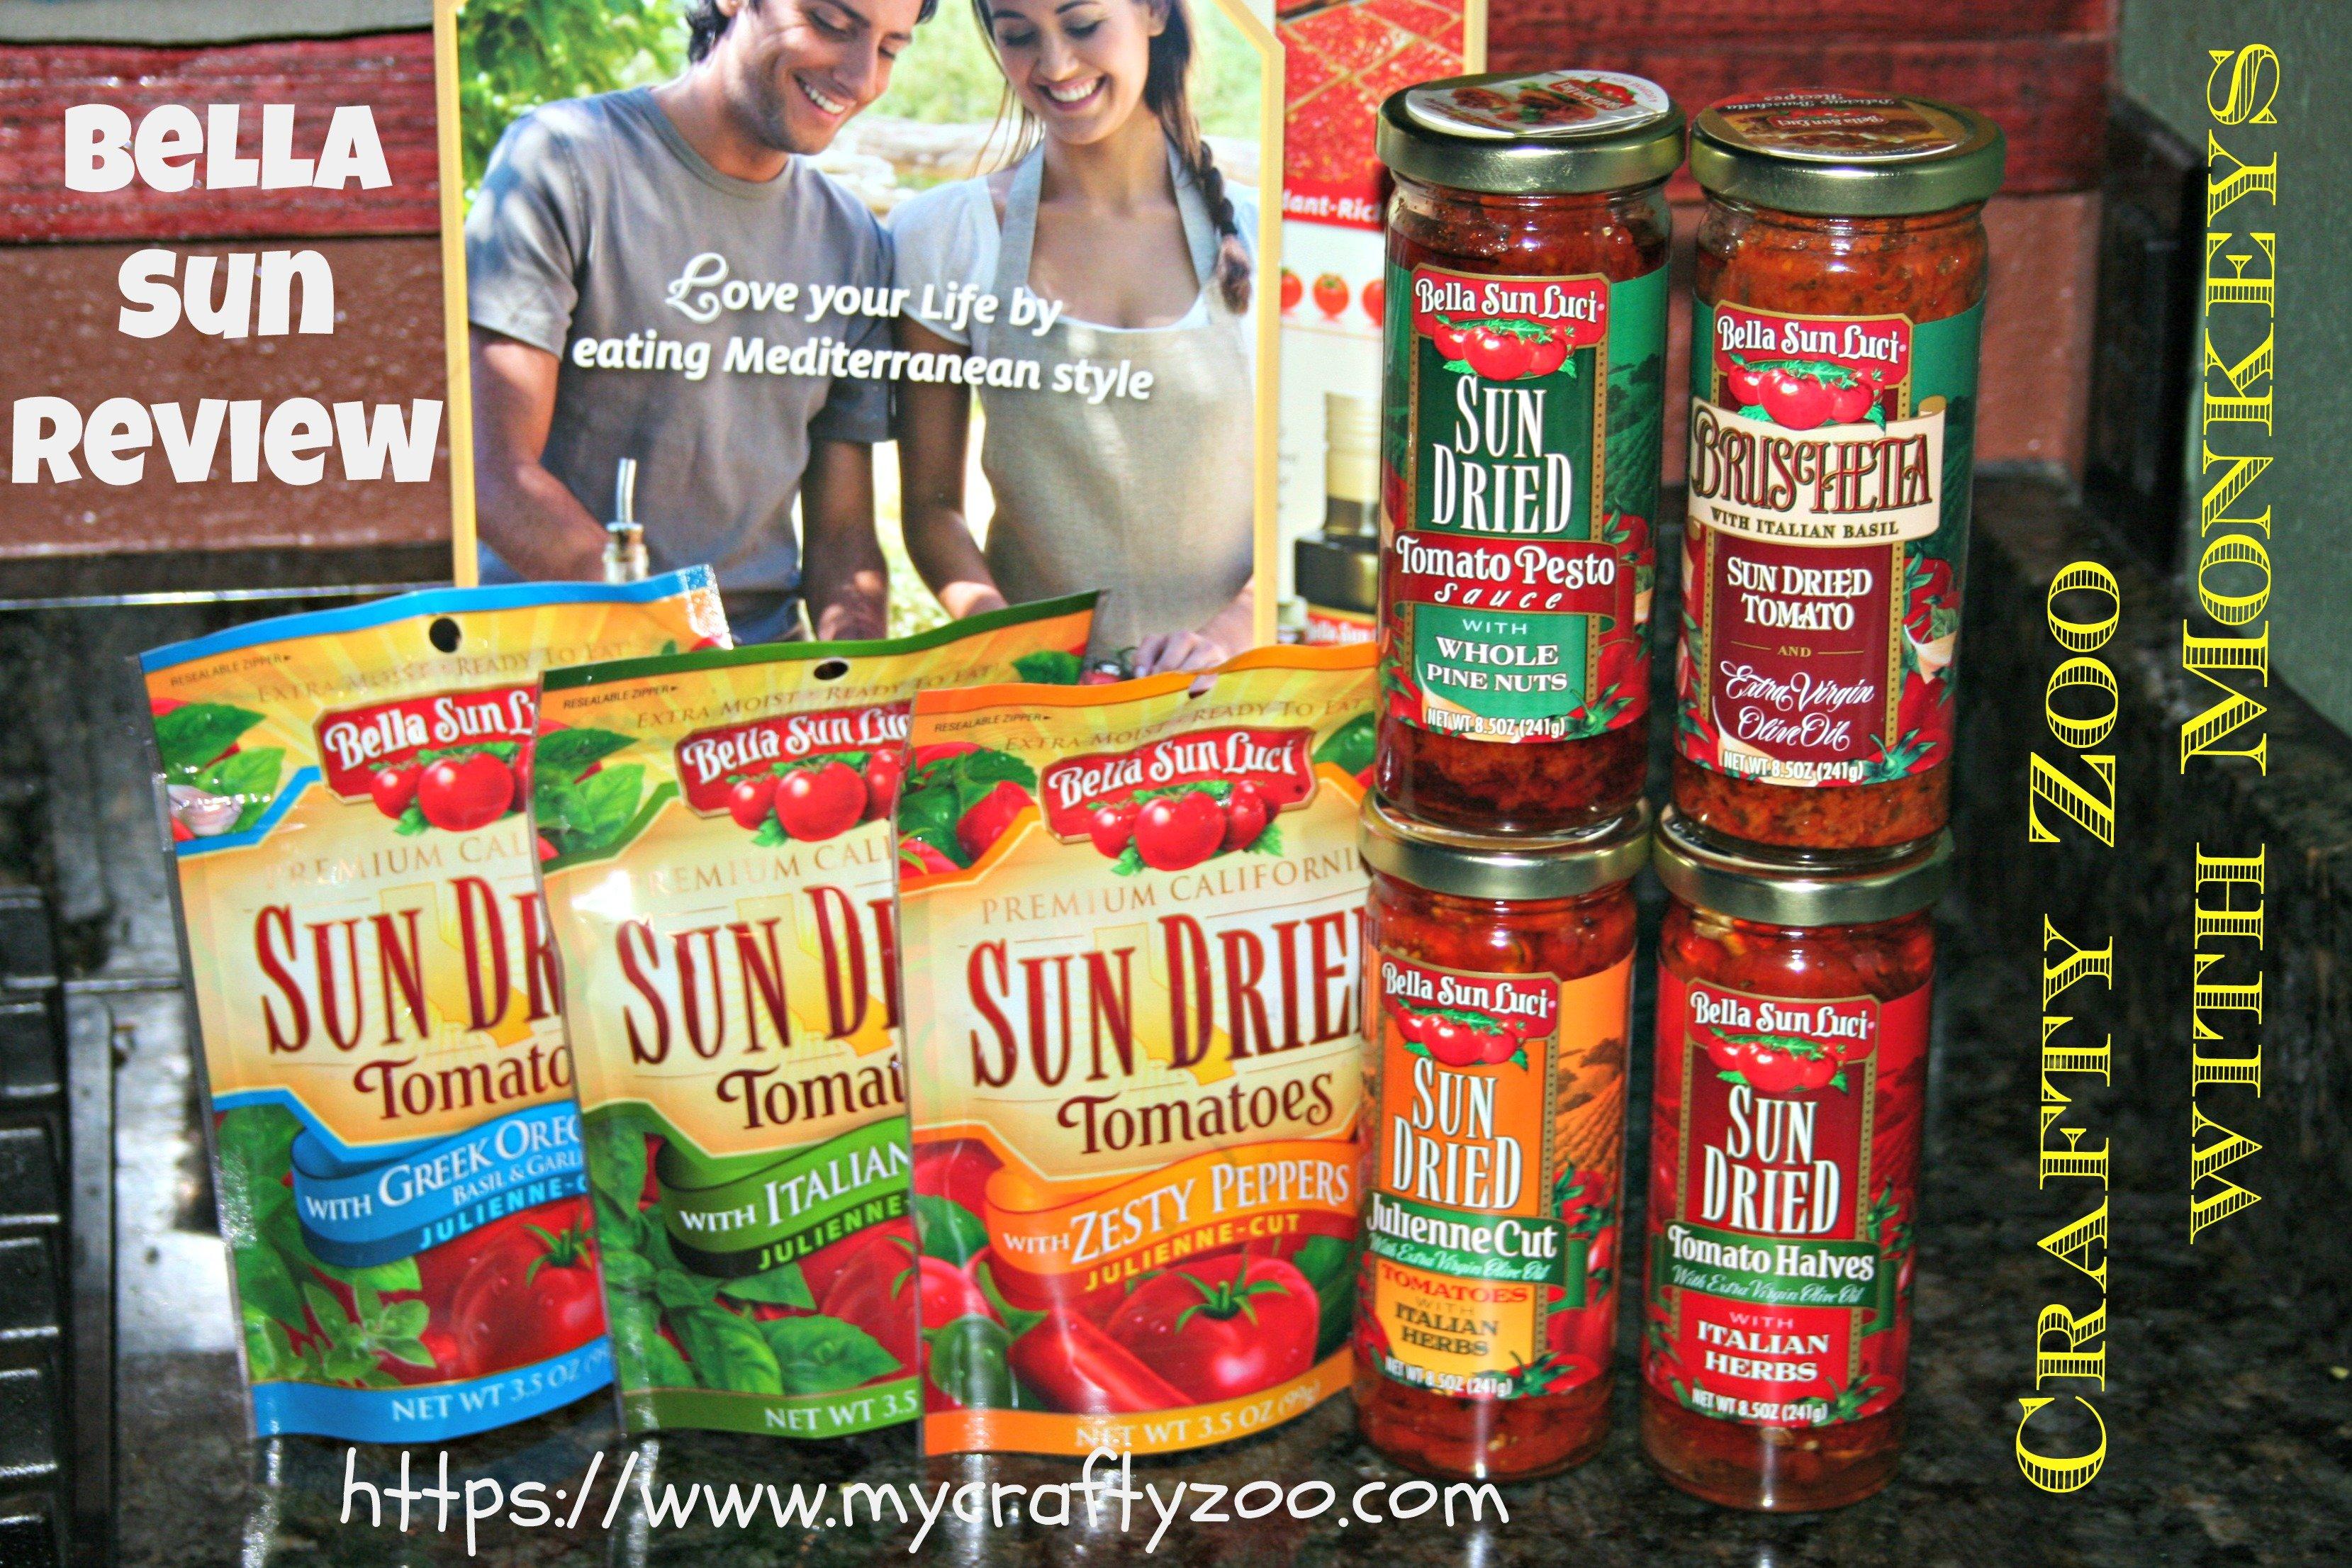 Mooney Farms Sundried Tomatoes